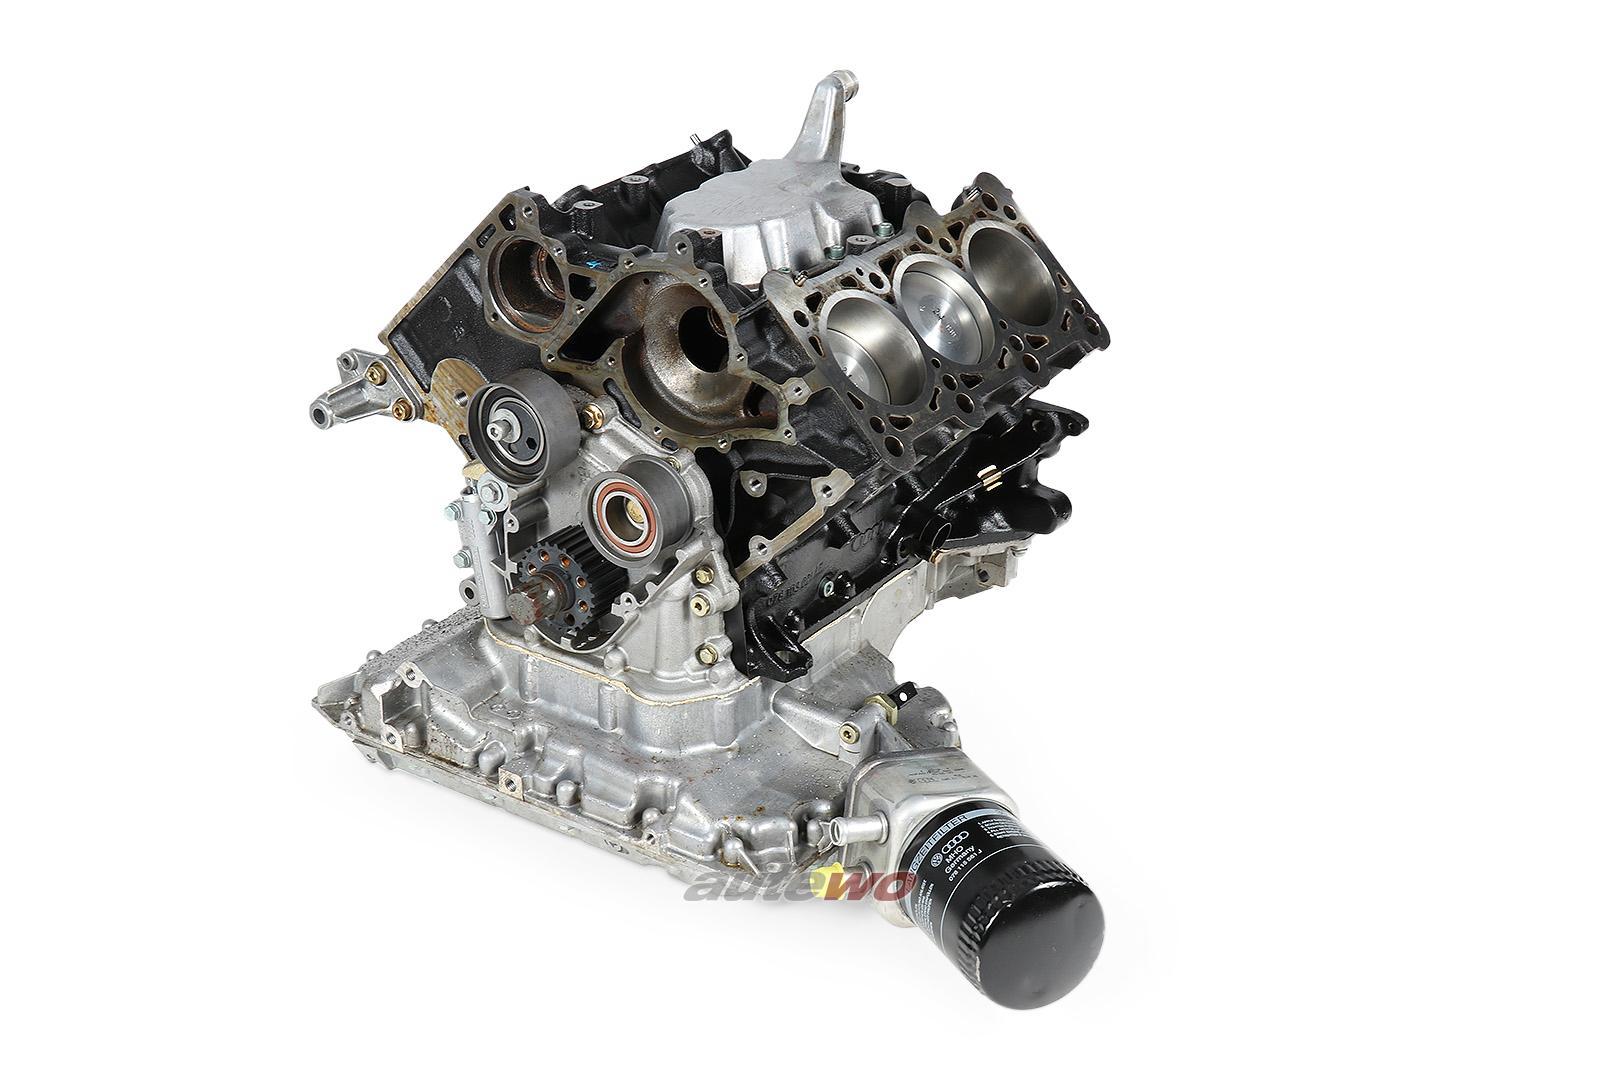 078103101BA NEU Audi A4 B5/8E/Cabrio 8H/A6 4B 2.4l V6 APS Motor APZ/AMM/ARJ/AML/BDV/ASM